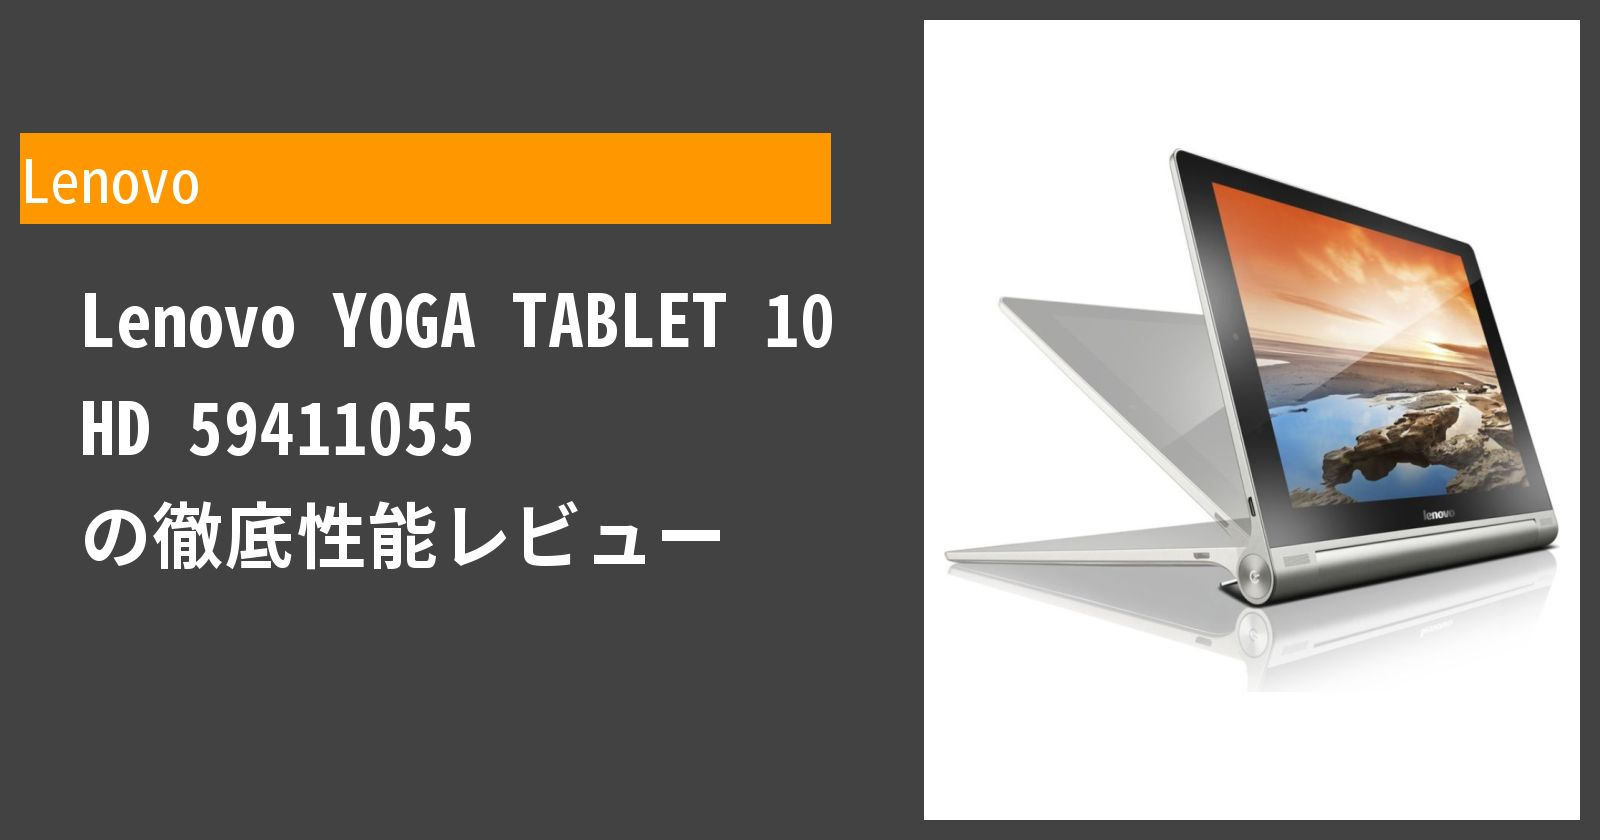 YOGA TABLET 10 HD 59411055 の徹底性能レビュー